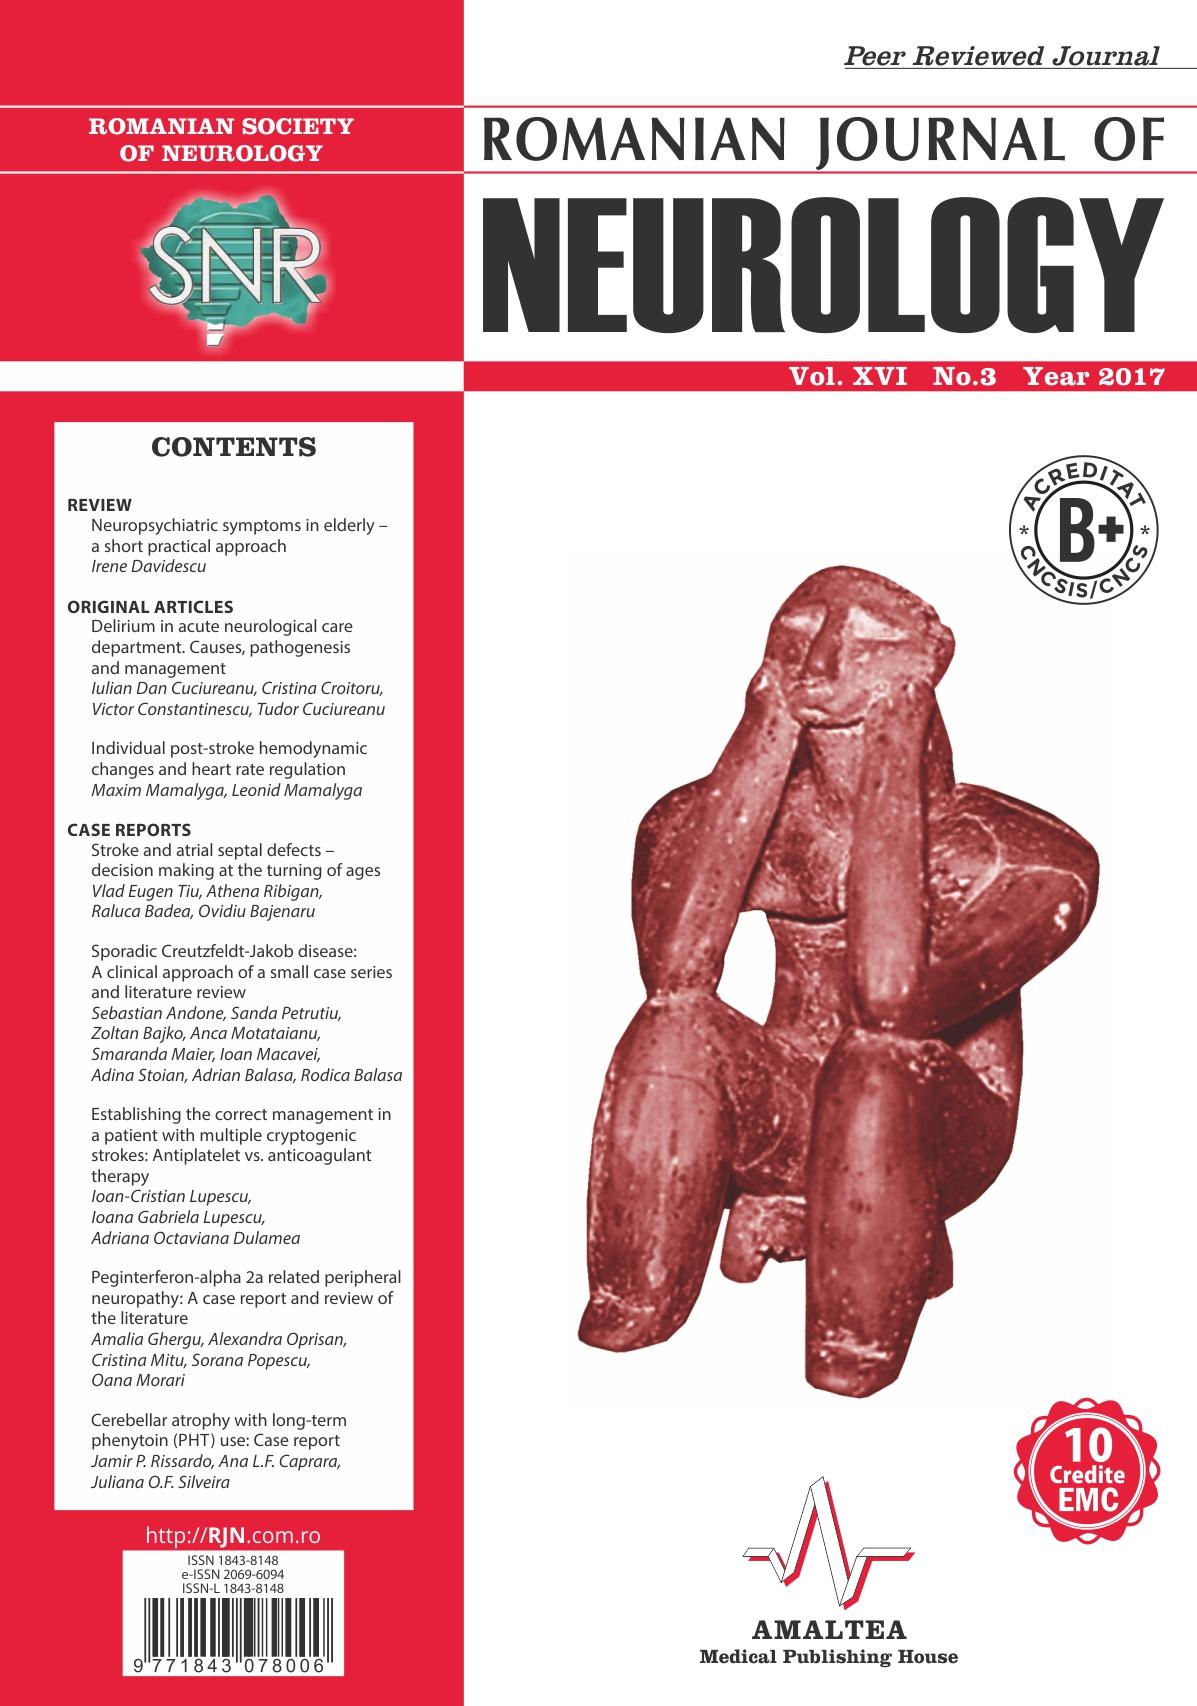 Romanian Journal of Neurology, Volume XVI, No. 3, 2017